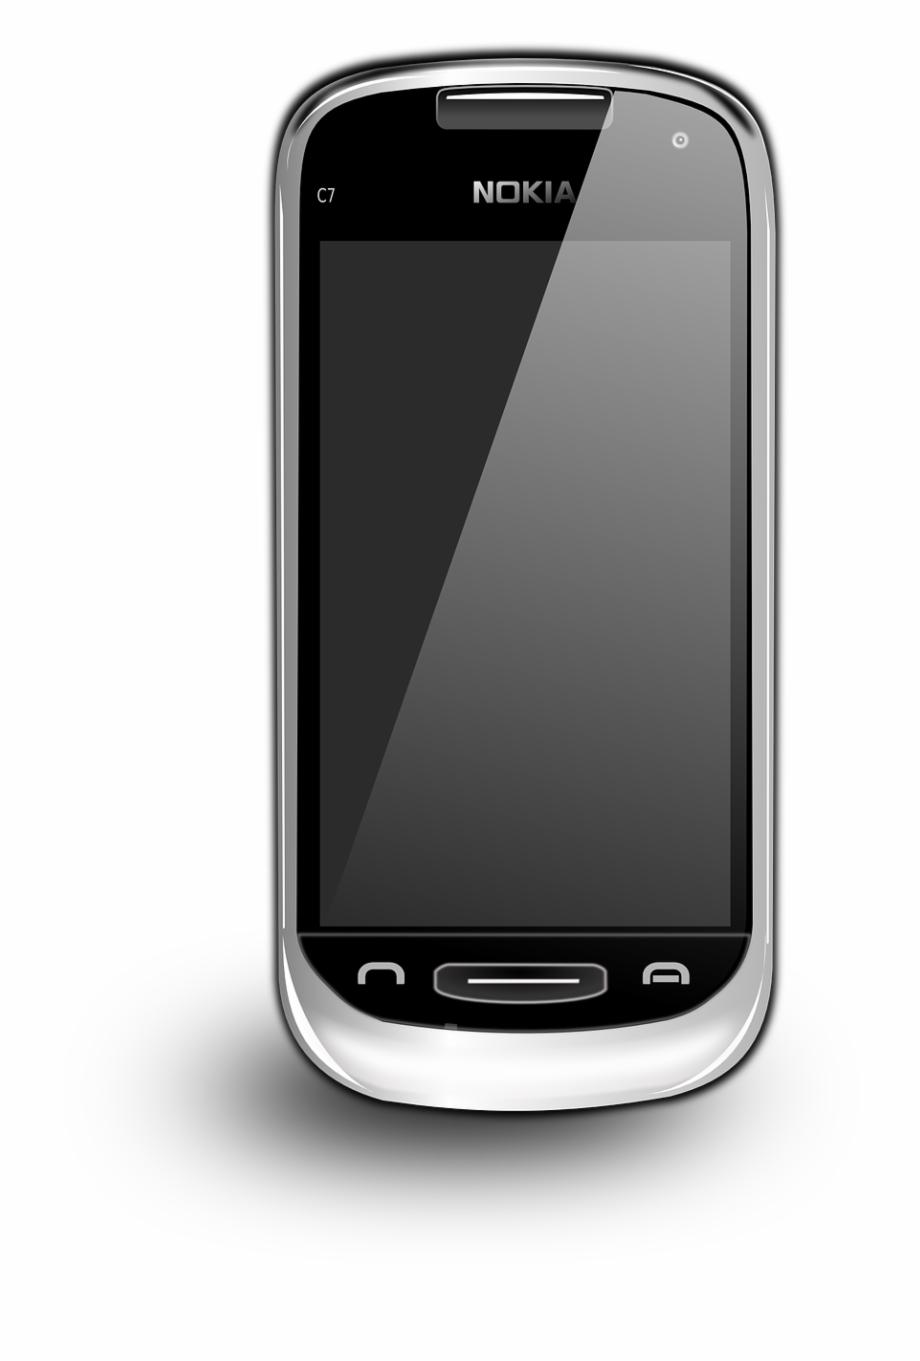 Nokia C Phone Icon Android Art 555px.